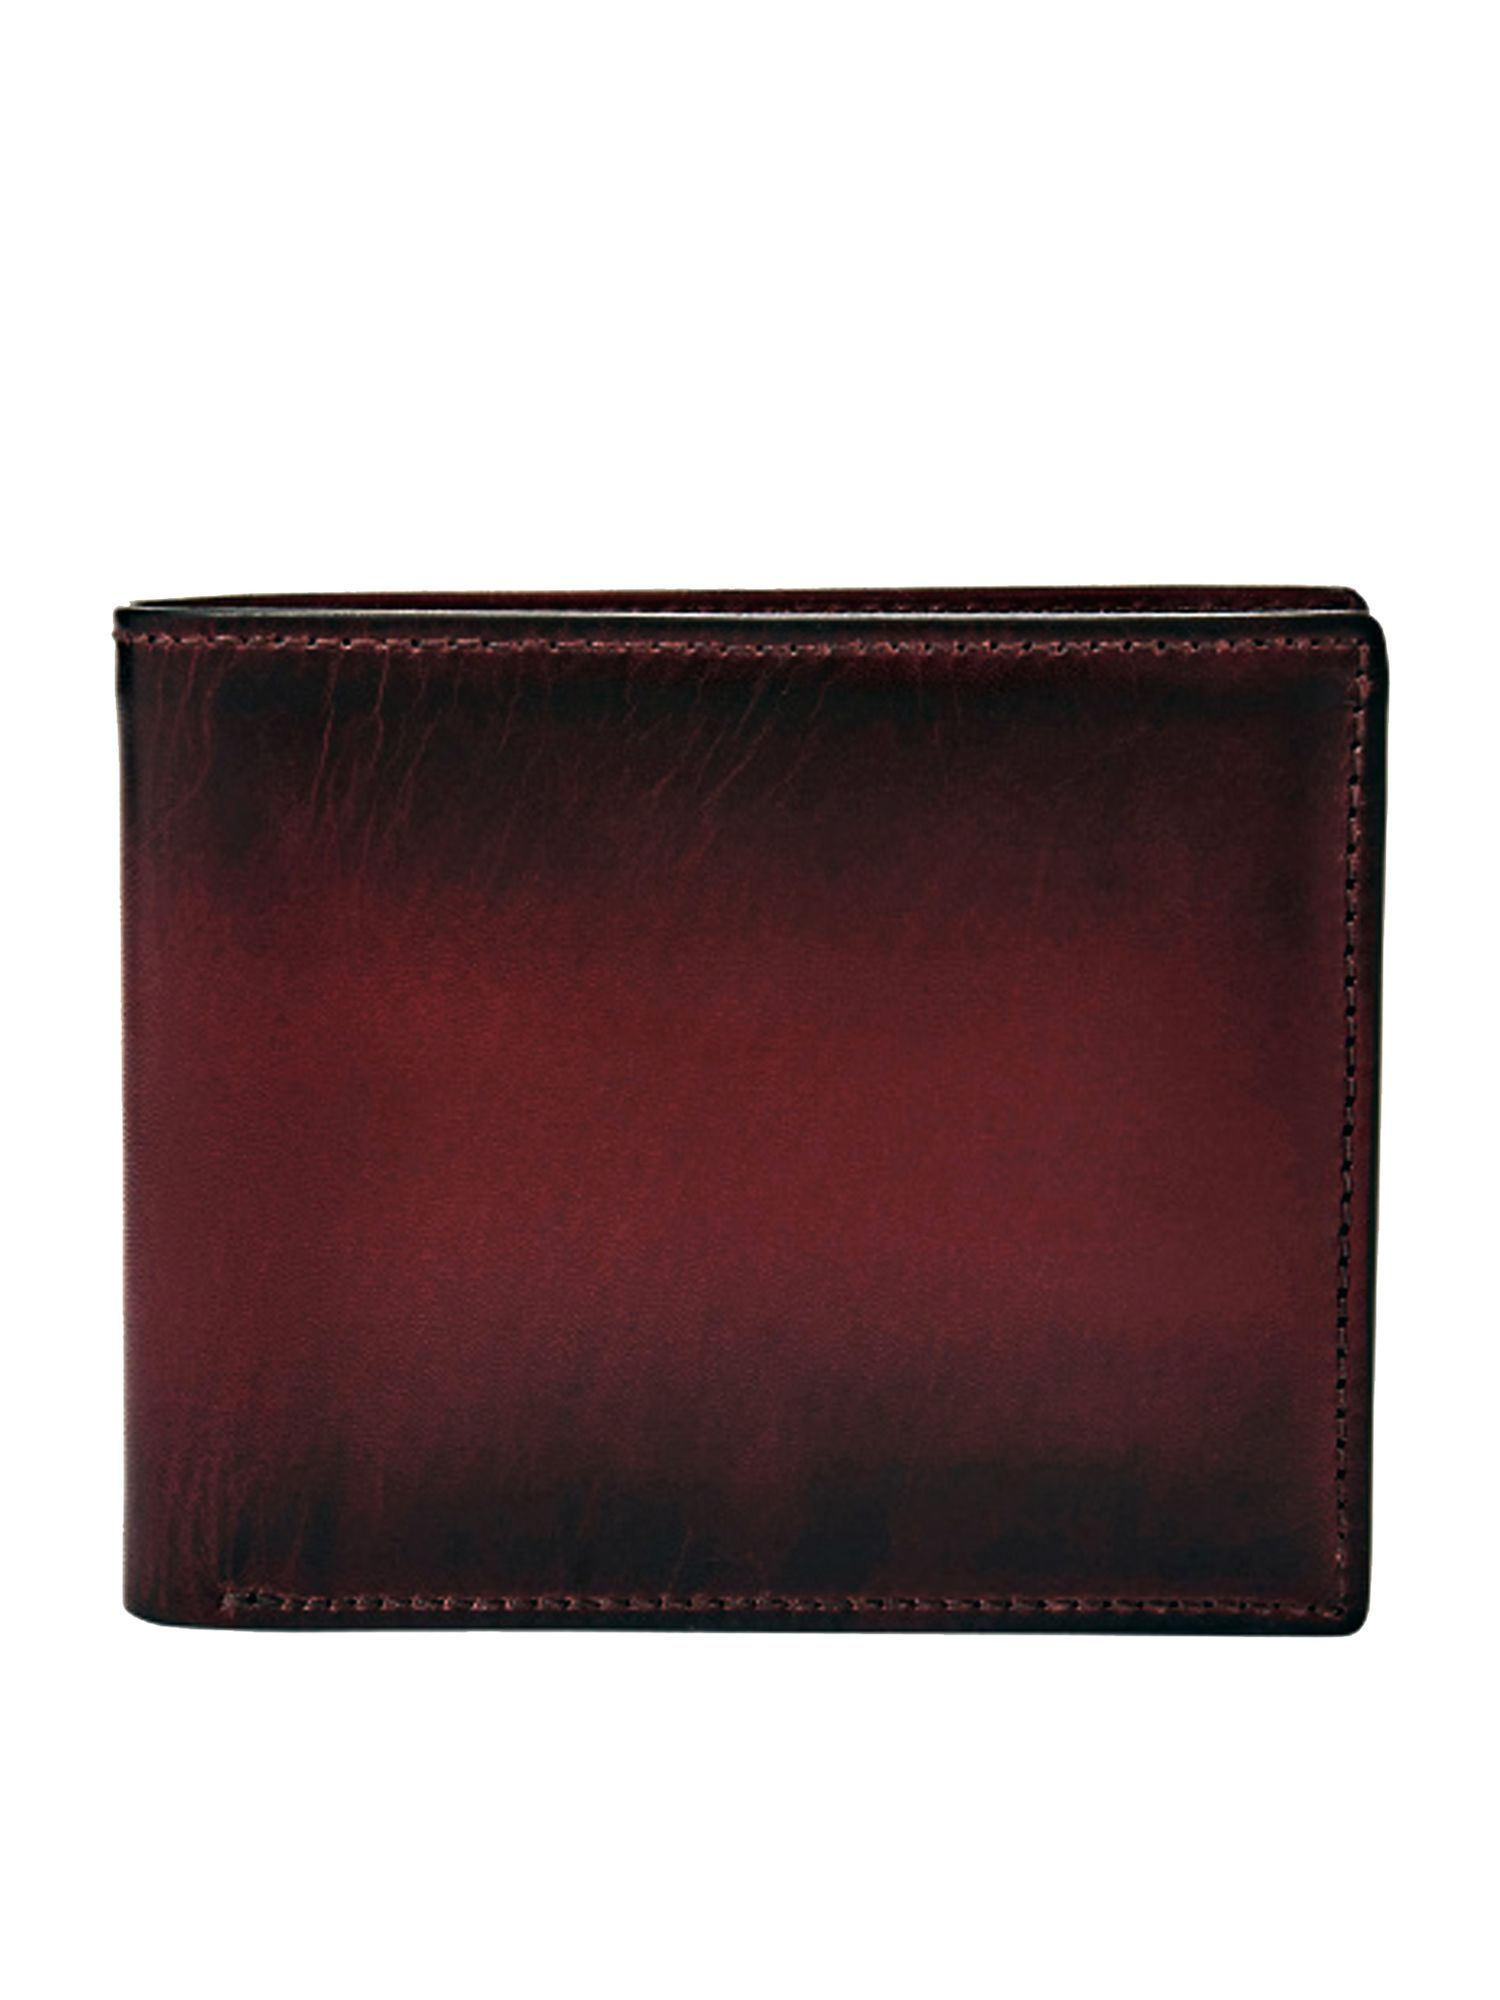 31a5e4c89cfa4 Fossil Herren Geldbörse PAUL Bifold Leder Rot ML3894-603 - Kaufen ...